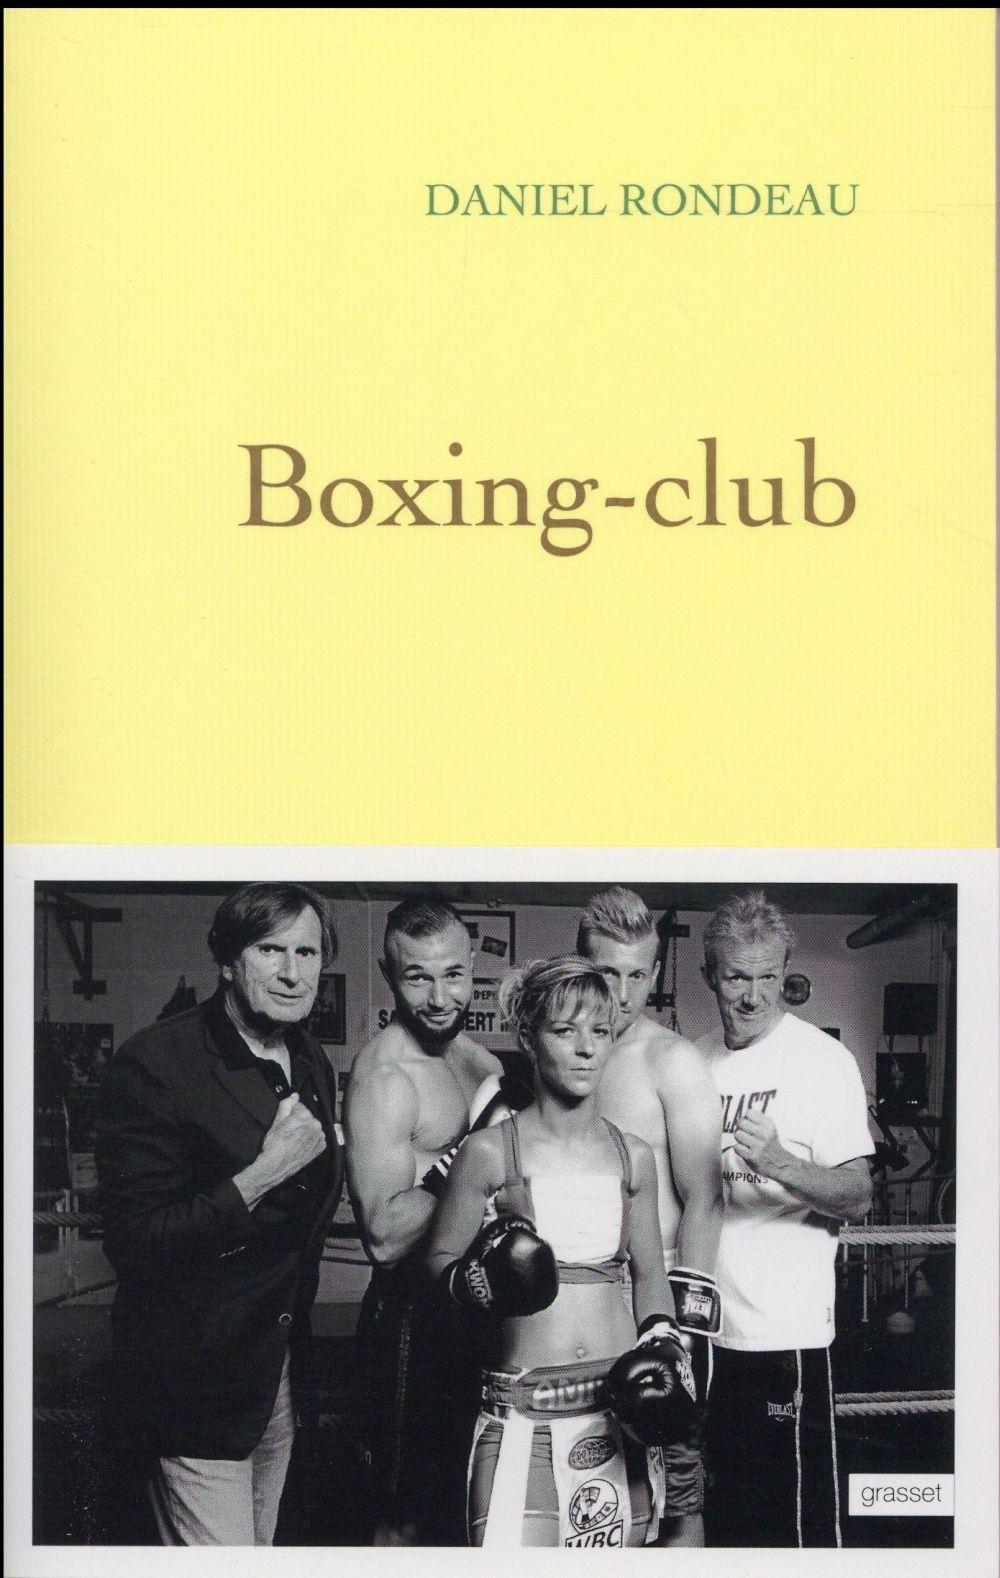 BOXING-CLUB Rondeau Daniel Grasset